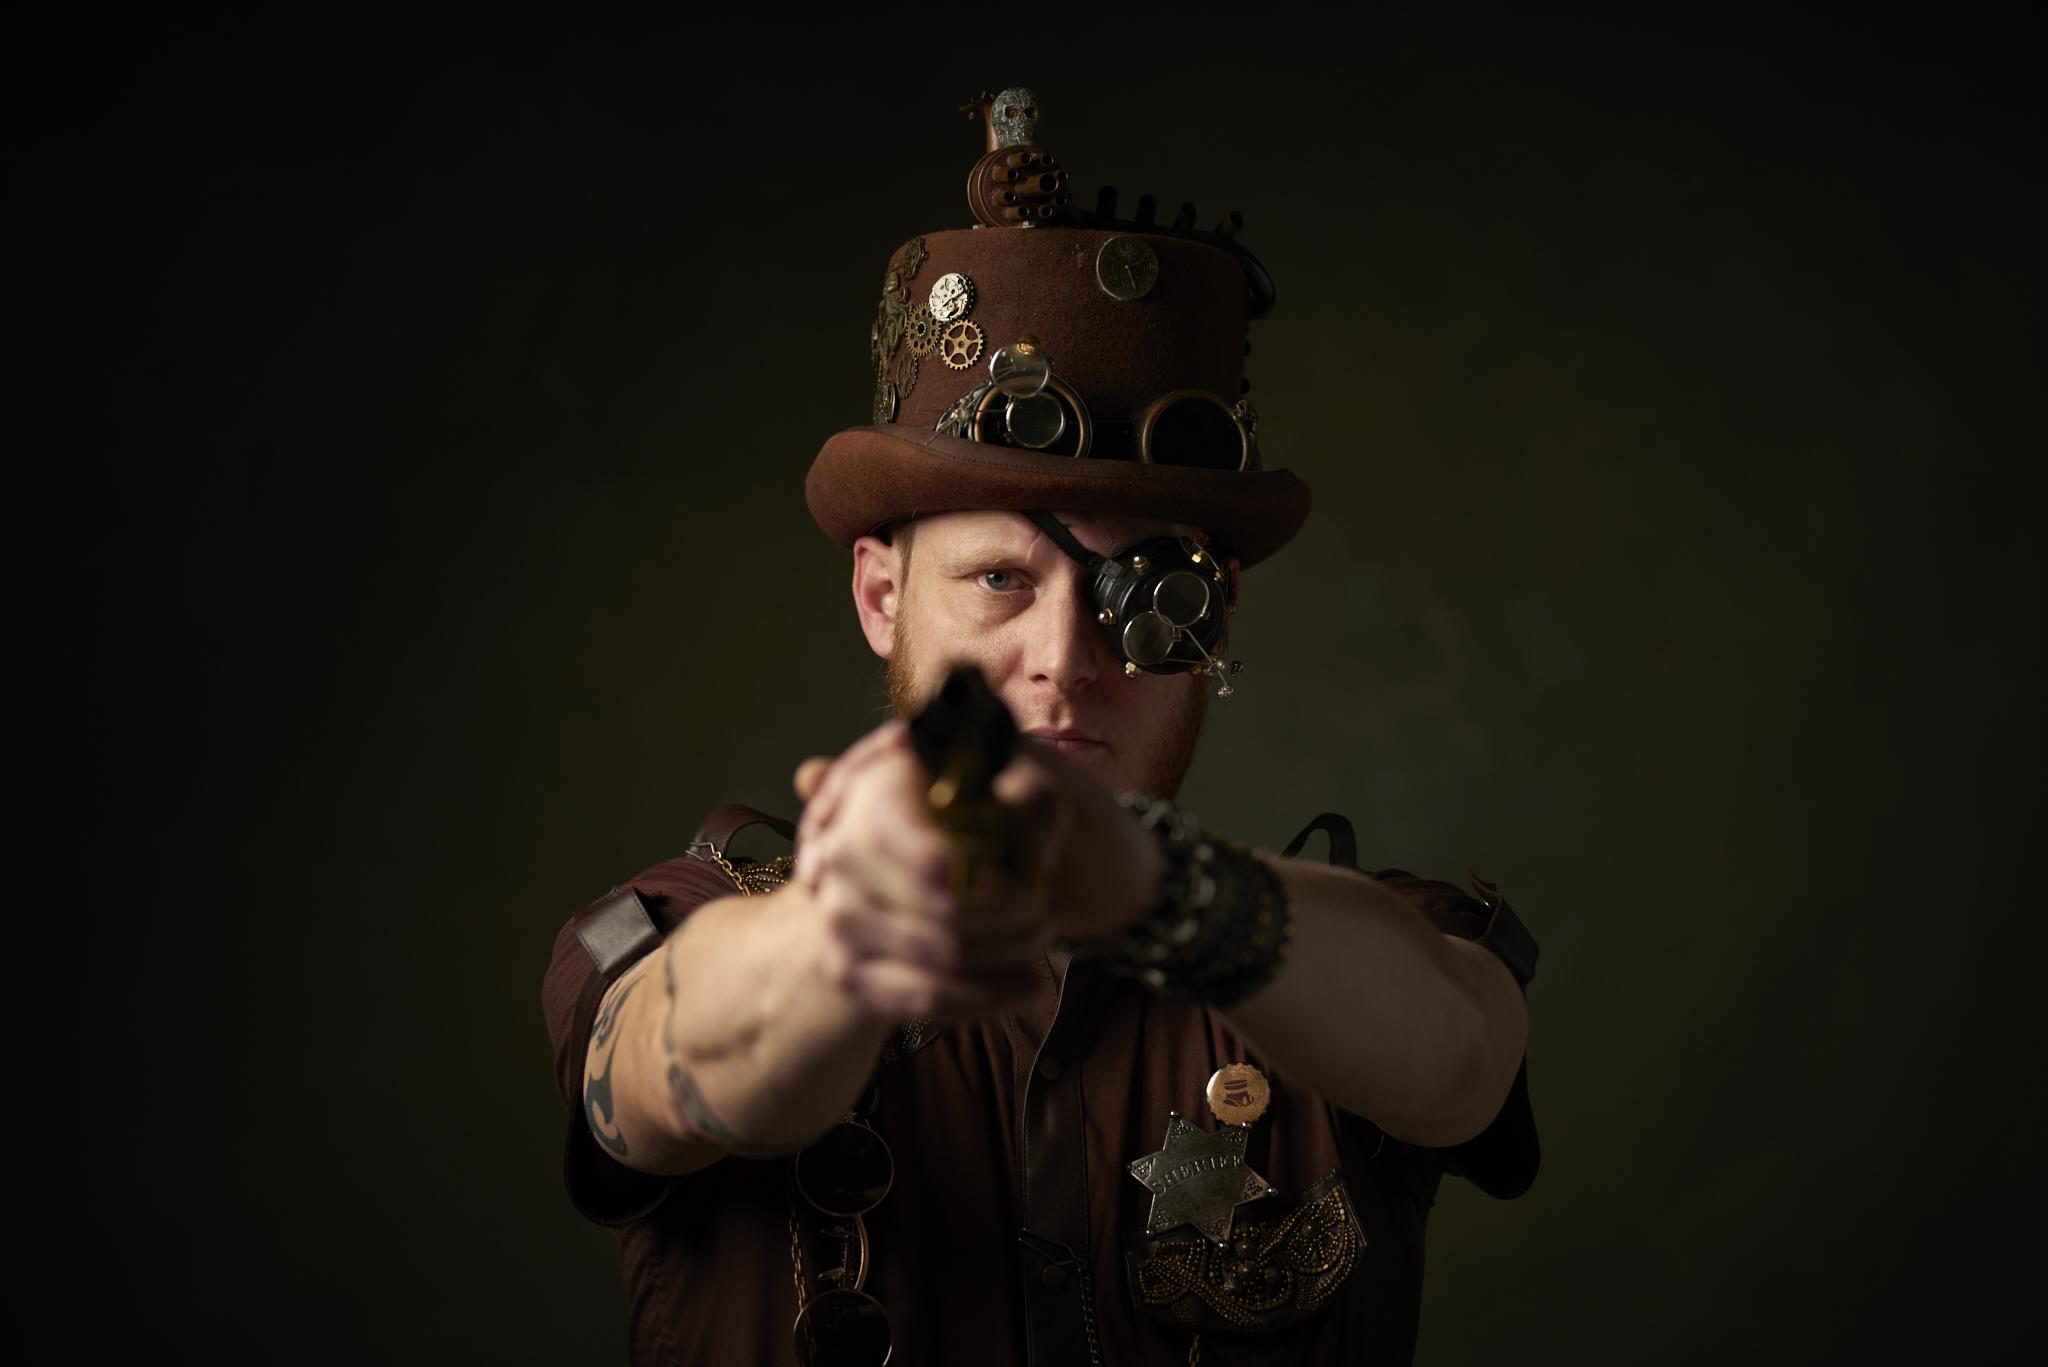 16_12_17_Steampunk Rembrandt en Boxer__DSC7331_EmptyName.jpg